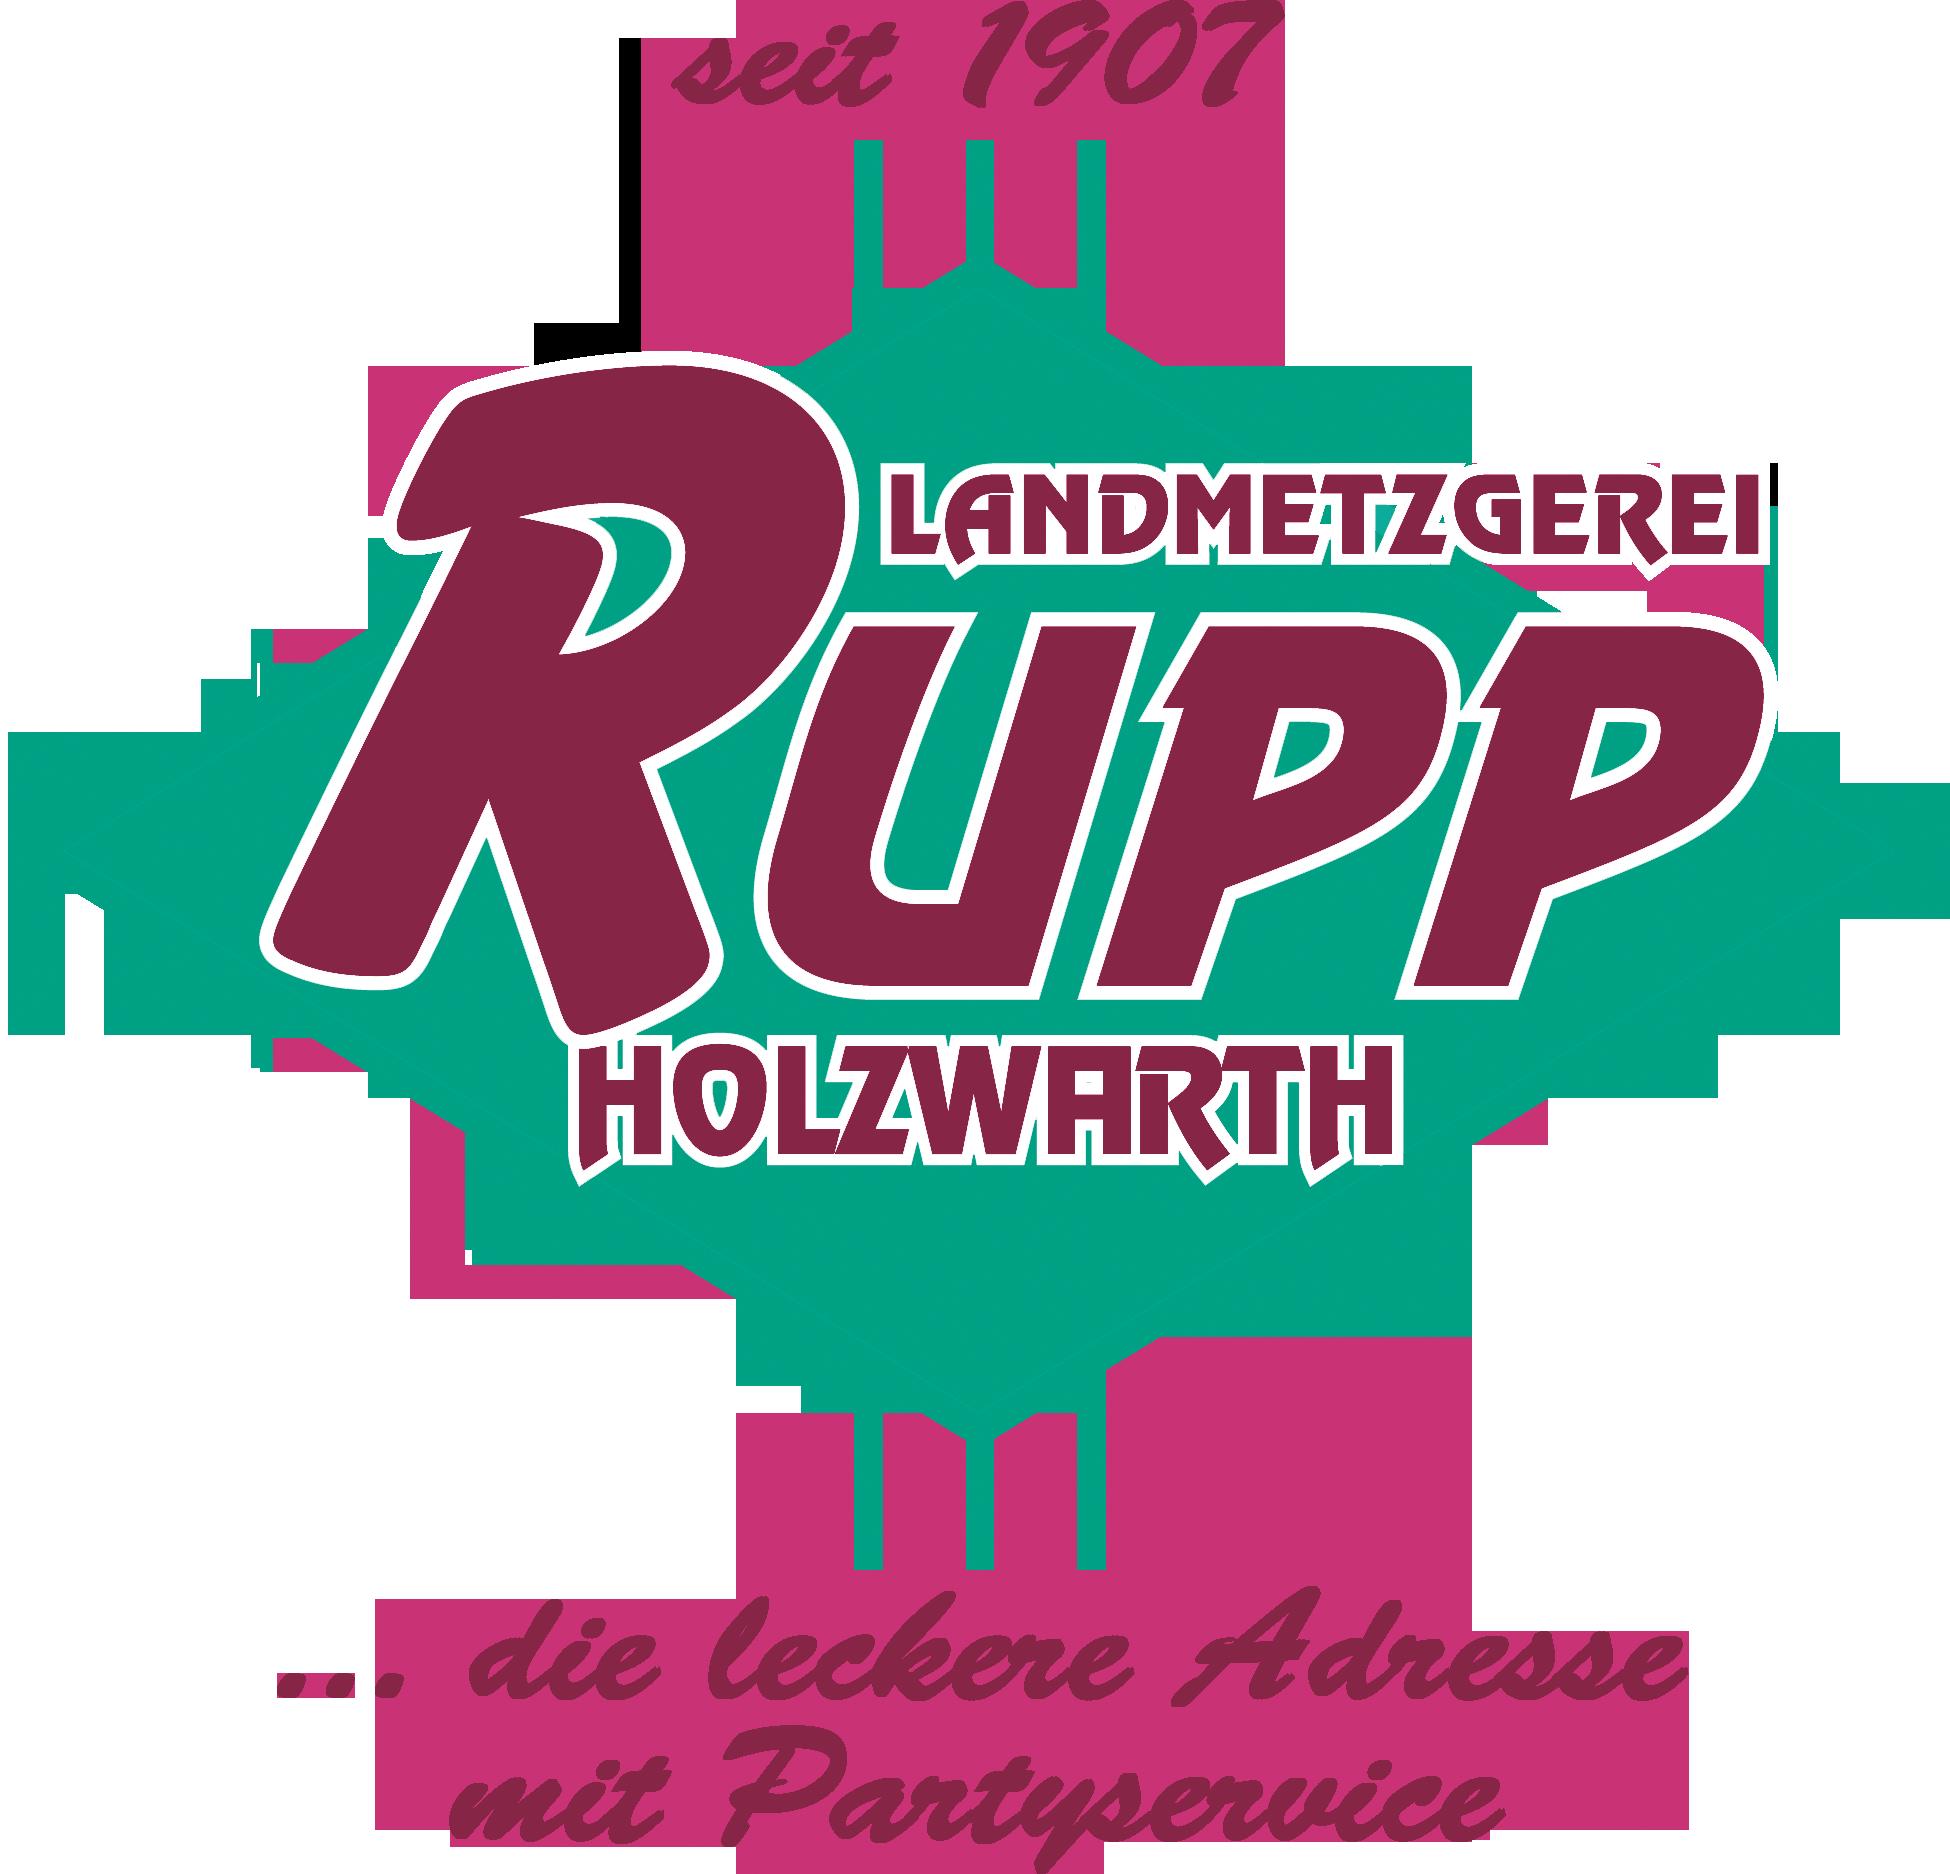 Landmetzgerei Rupp & Holzwarth